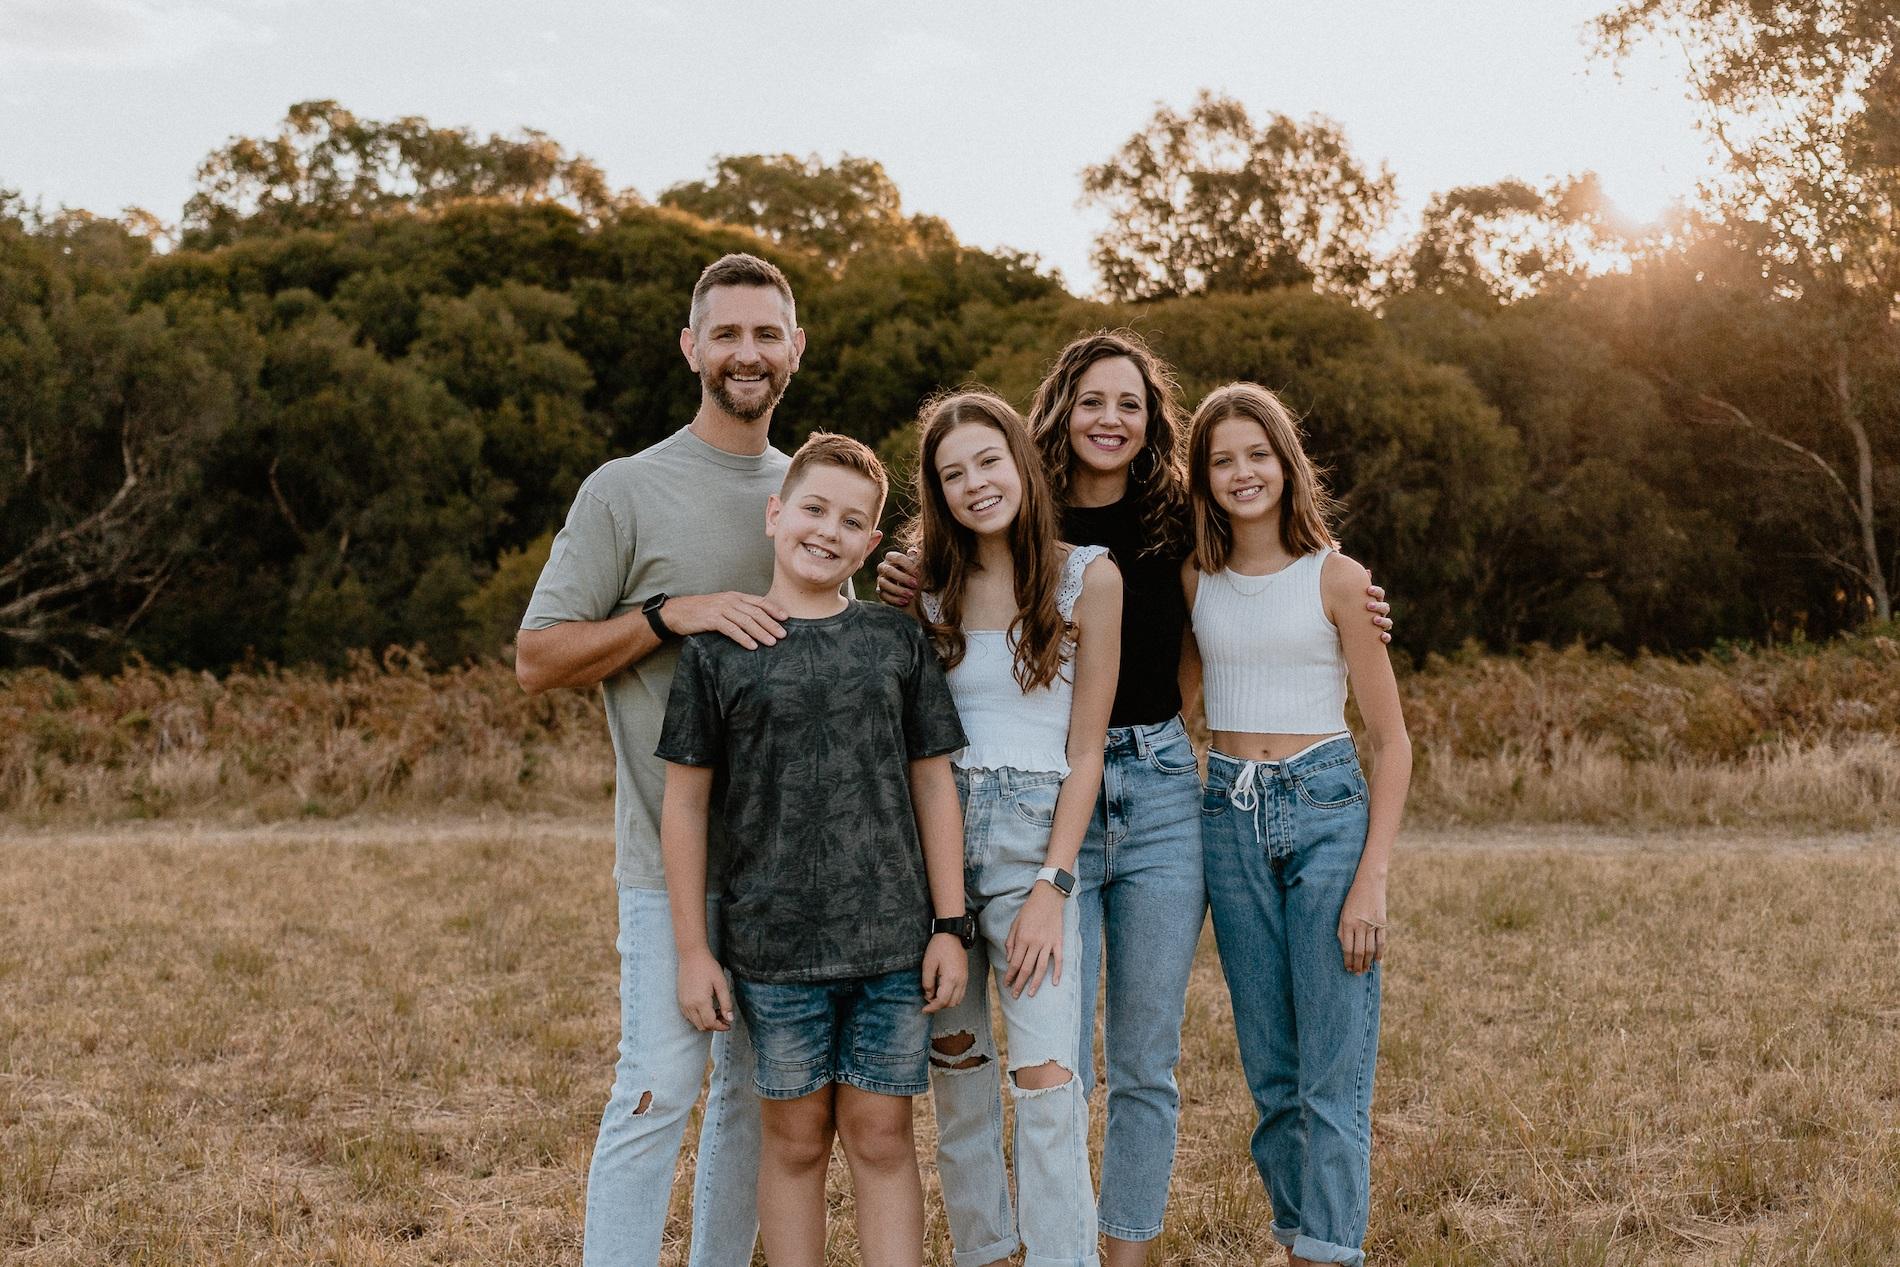 Jason and Emma Schroeder - Lead Pastors